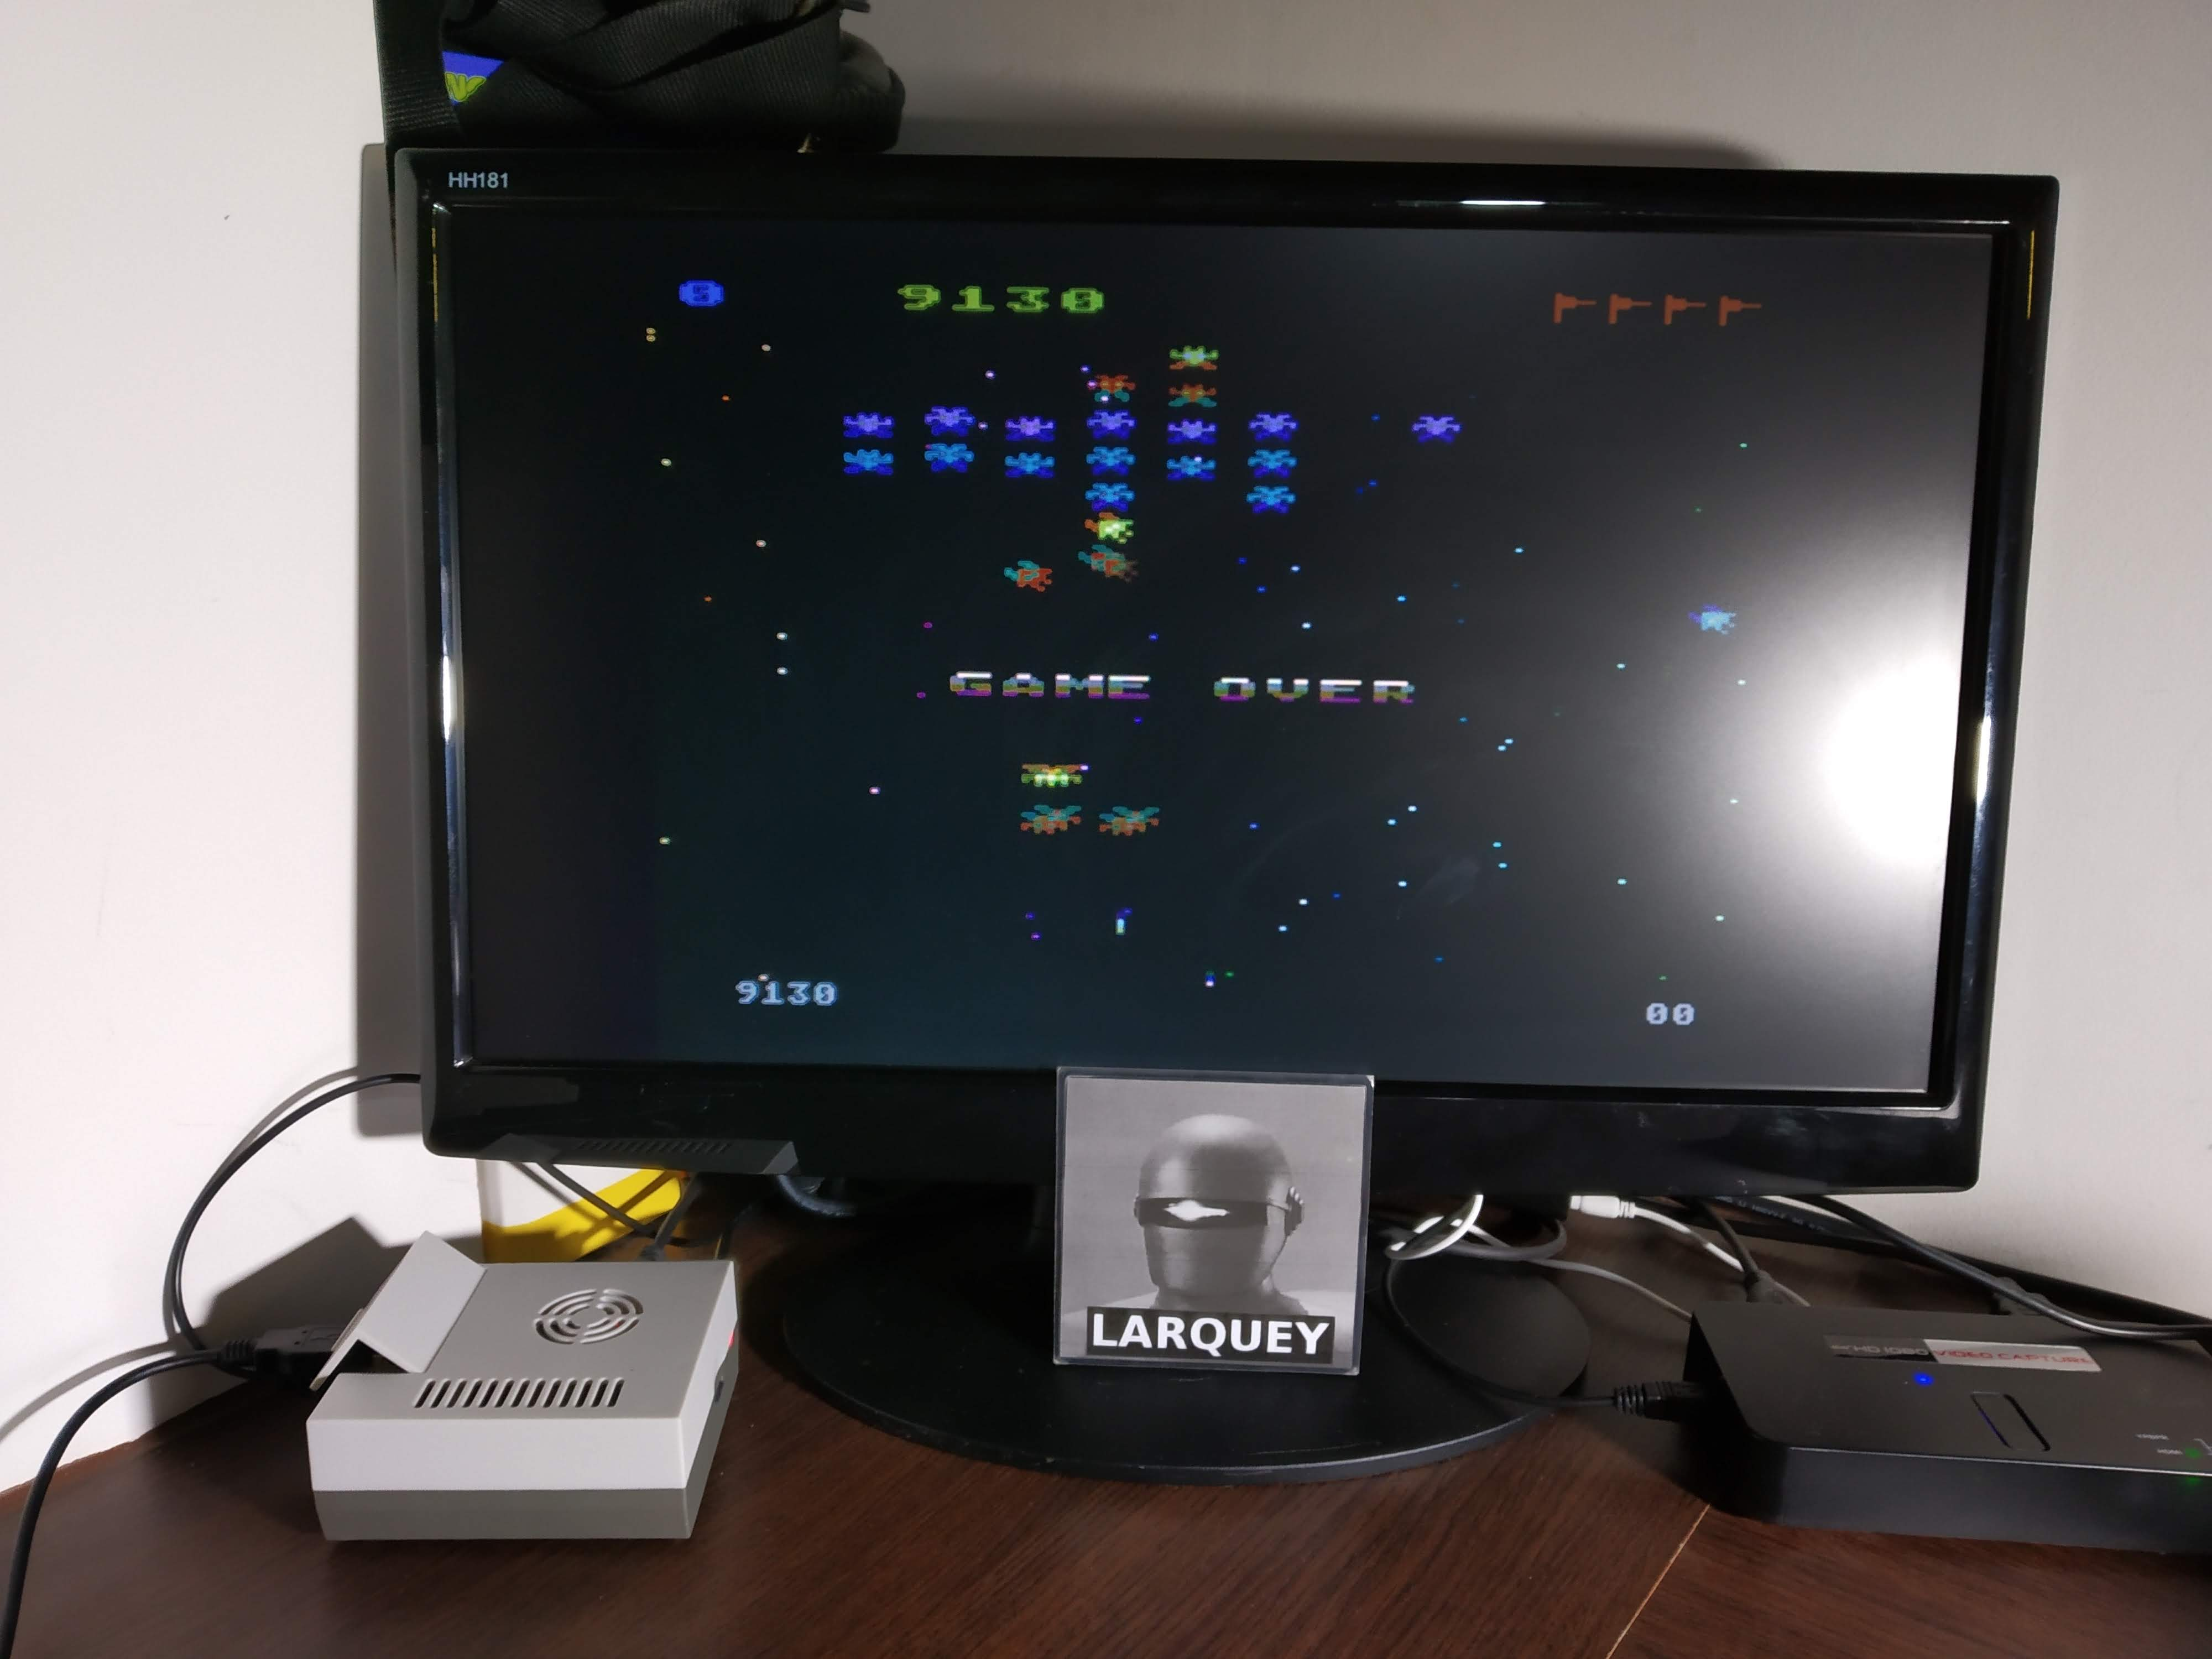 Larquey: Galaxian: Skill Level 1 (Atari 5200 Emulated) 9,130 points on 2019-11-09 03:37:06